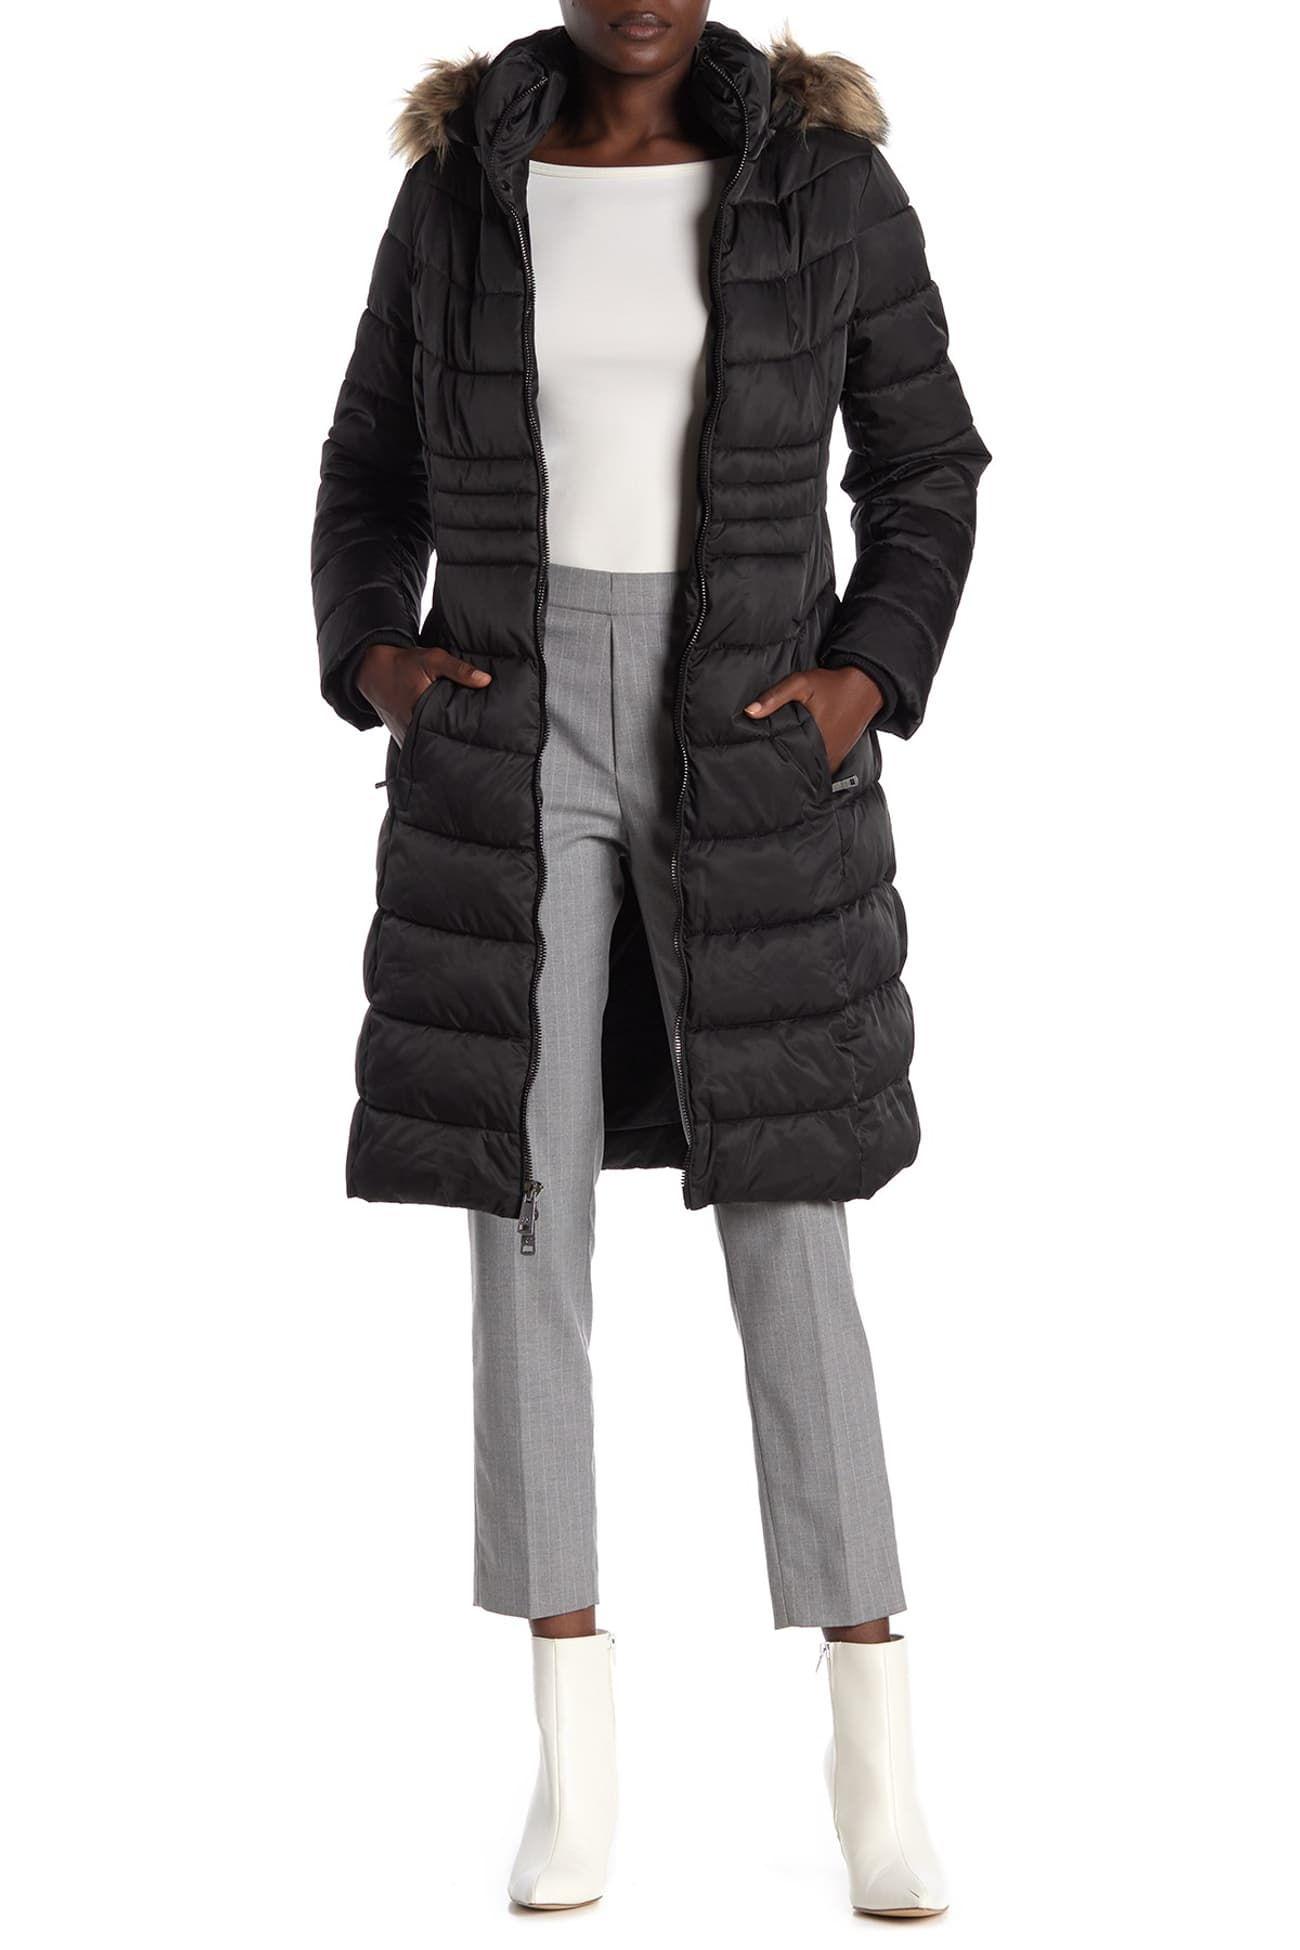 cold weather gear flash sale